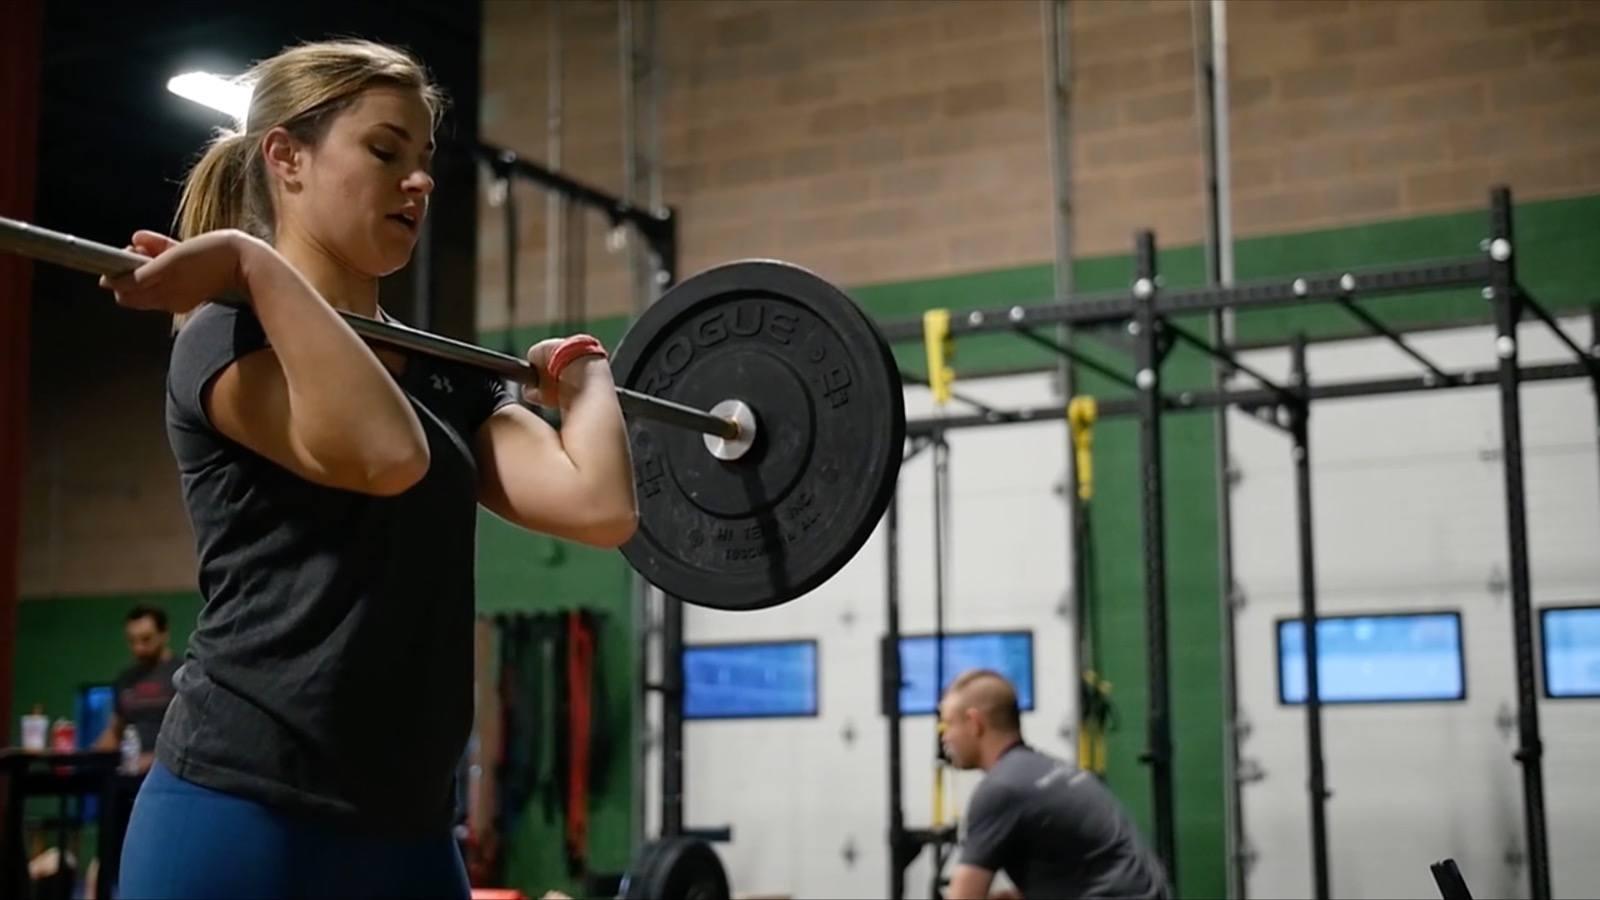 Waltham Personal Training